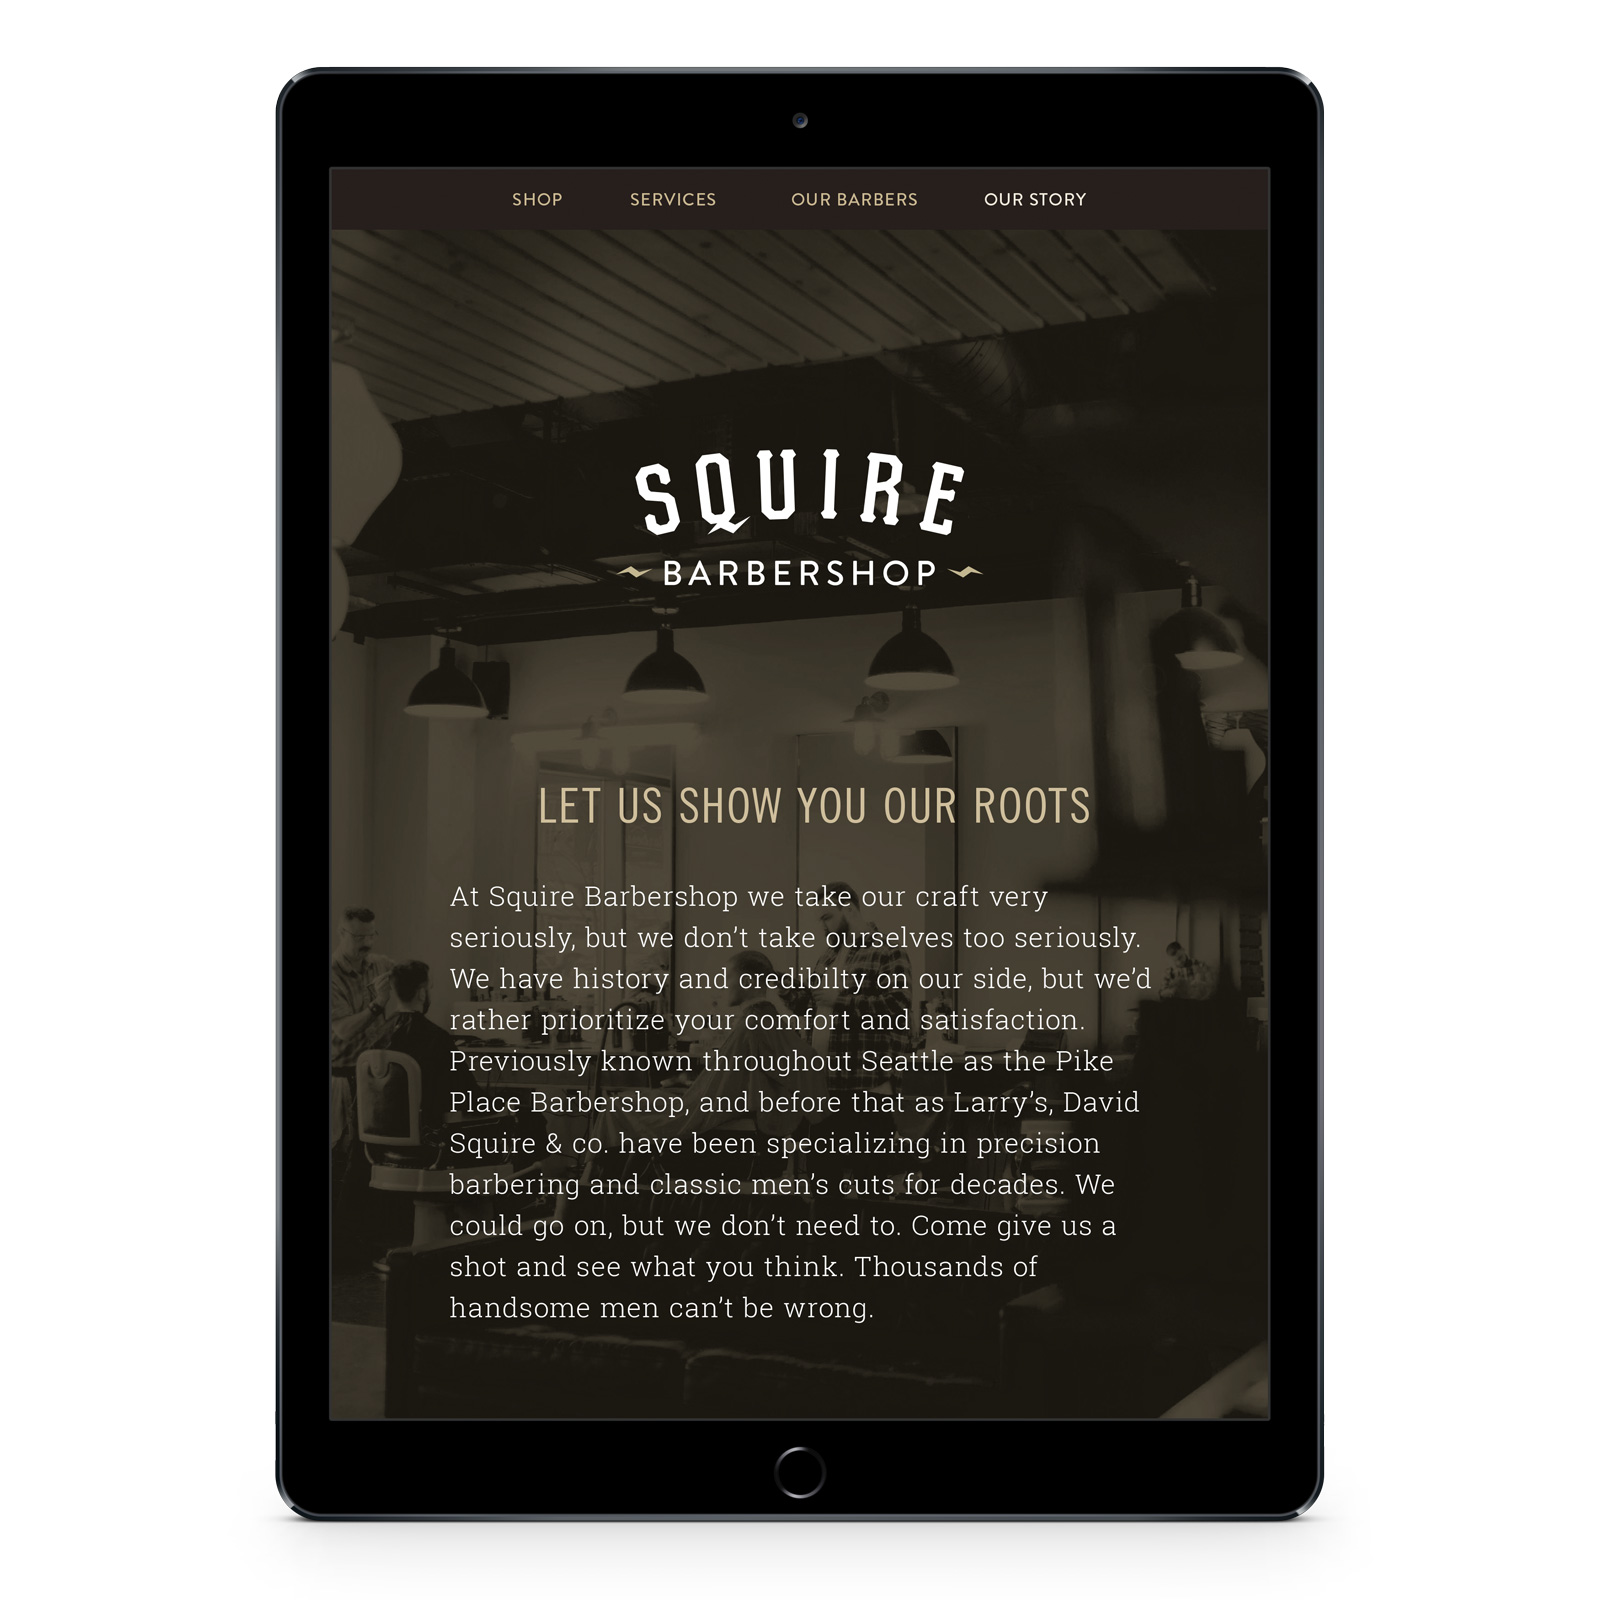 Squire-iPad-mockup01.jpg